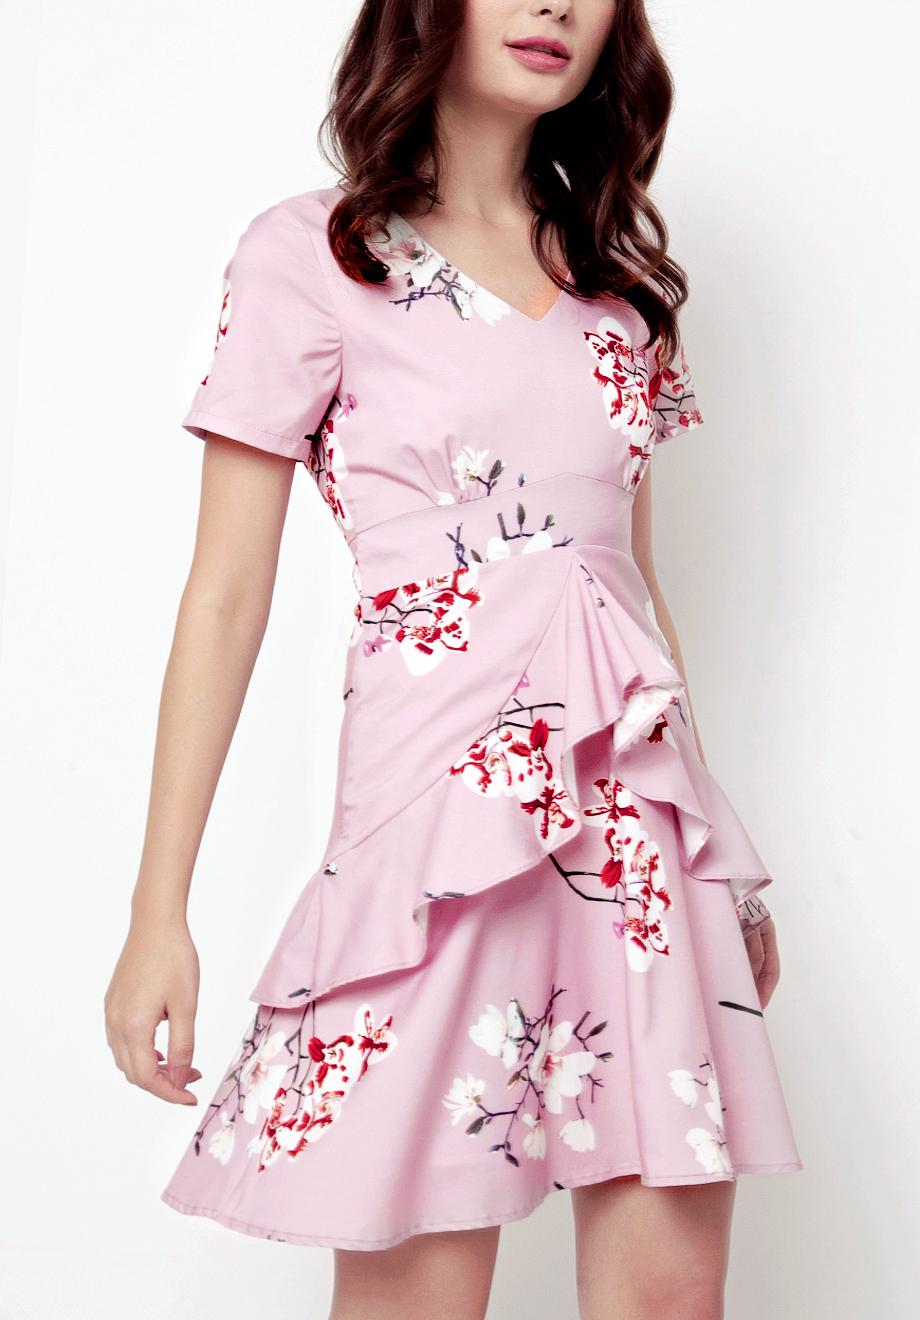 Dresses Chocochips Boutique Marino Dress Blue 39 Off